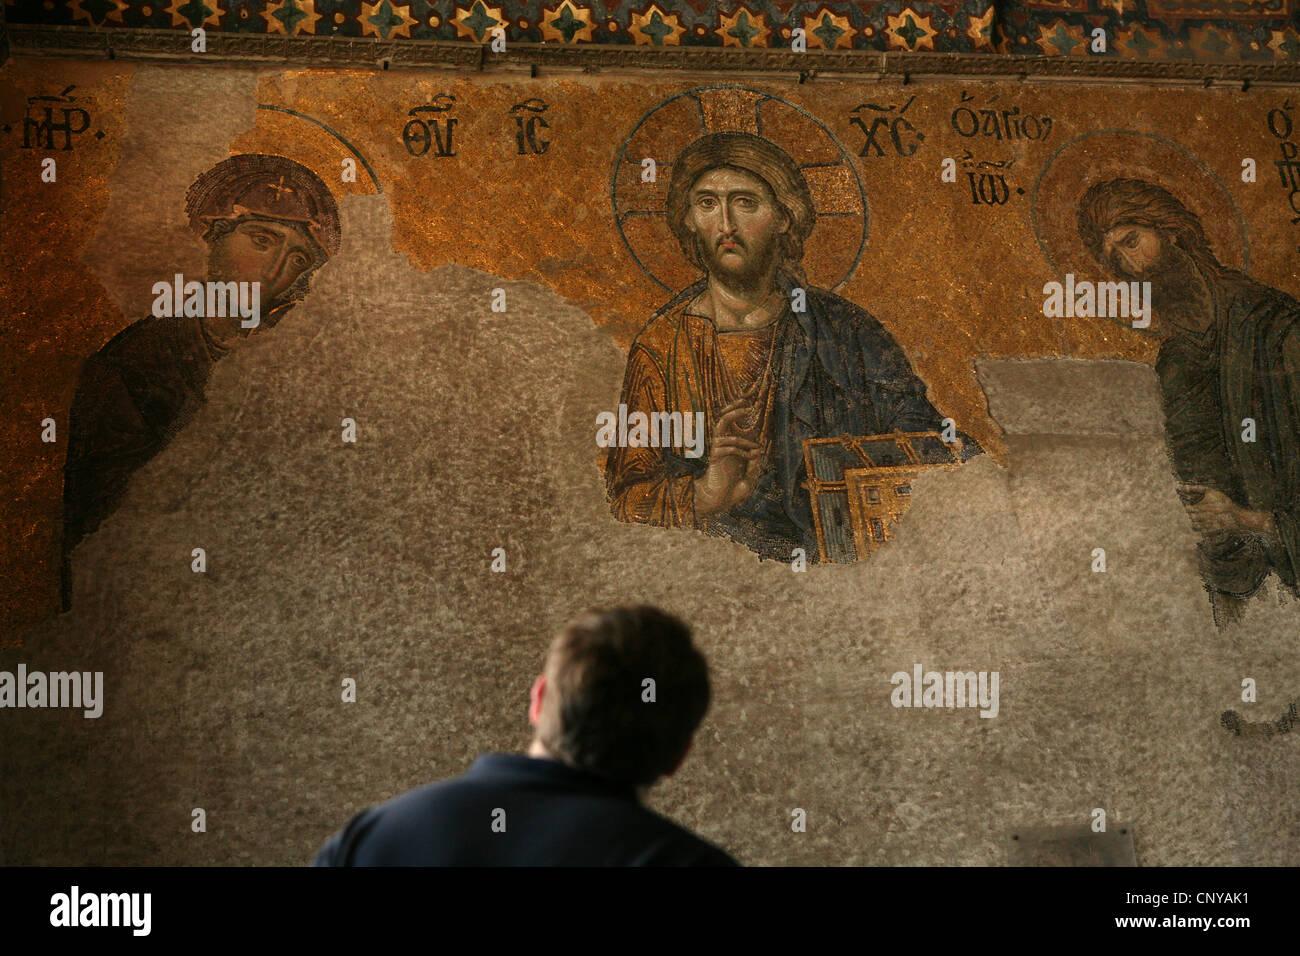 Byzantine Deesis mosaic on the upper galleries of Hagia Sophia in Istanbul, Turkey. Stock Photo